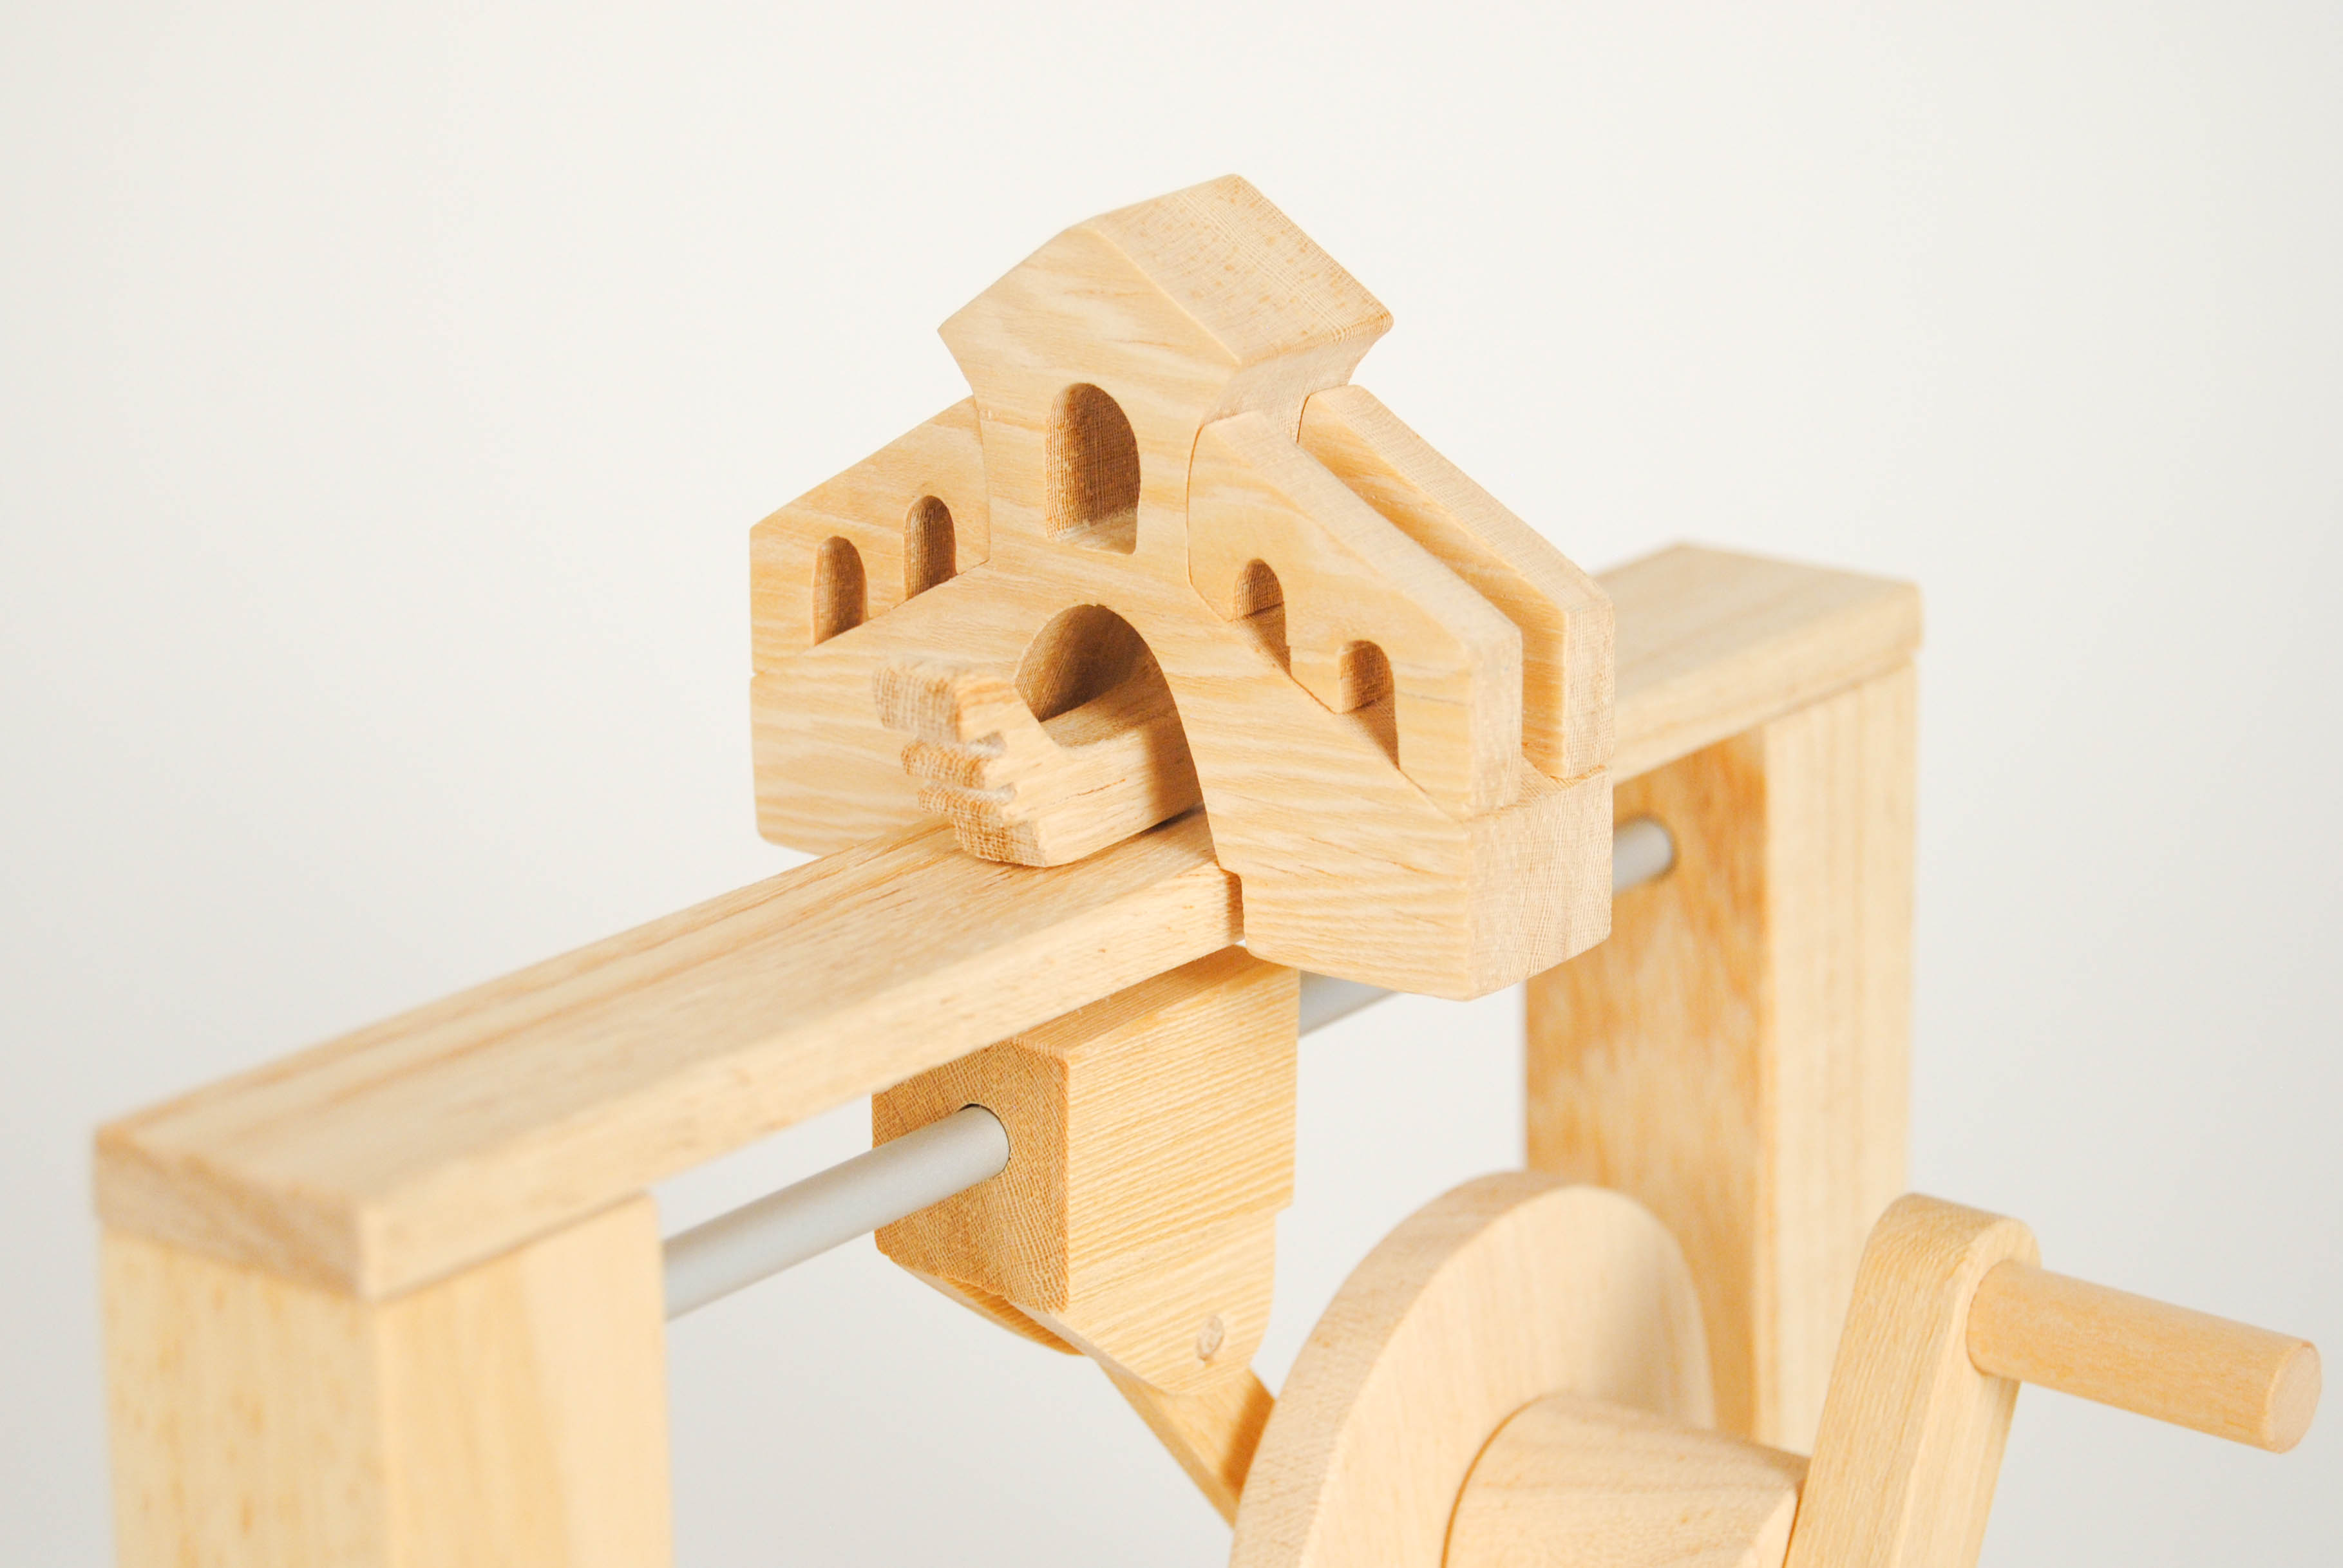 leonardo da vinci magnetic wooden toy with boat under the bridge in venice